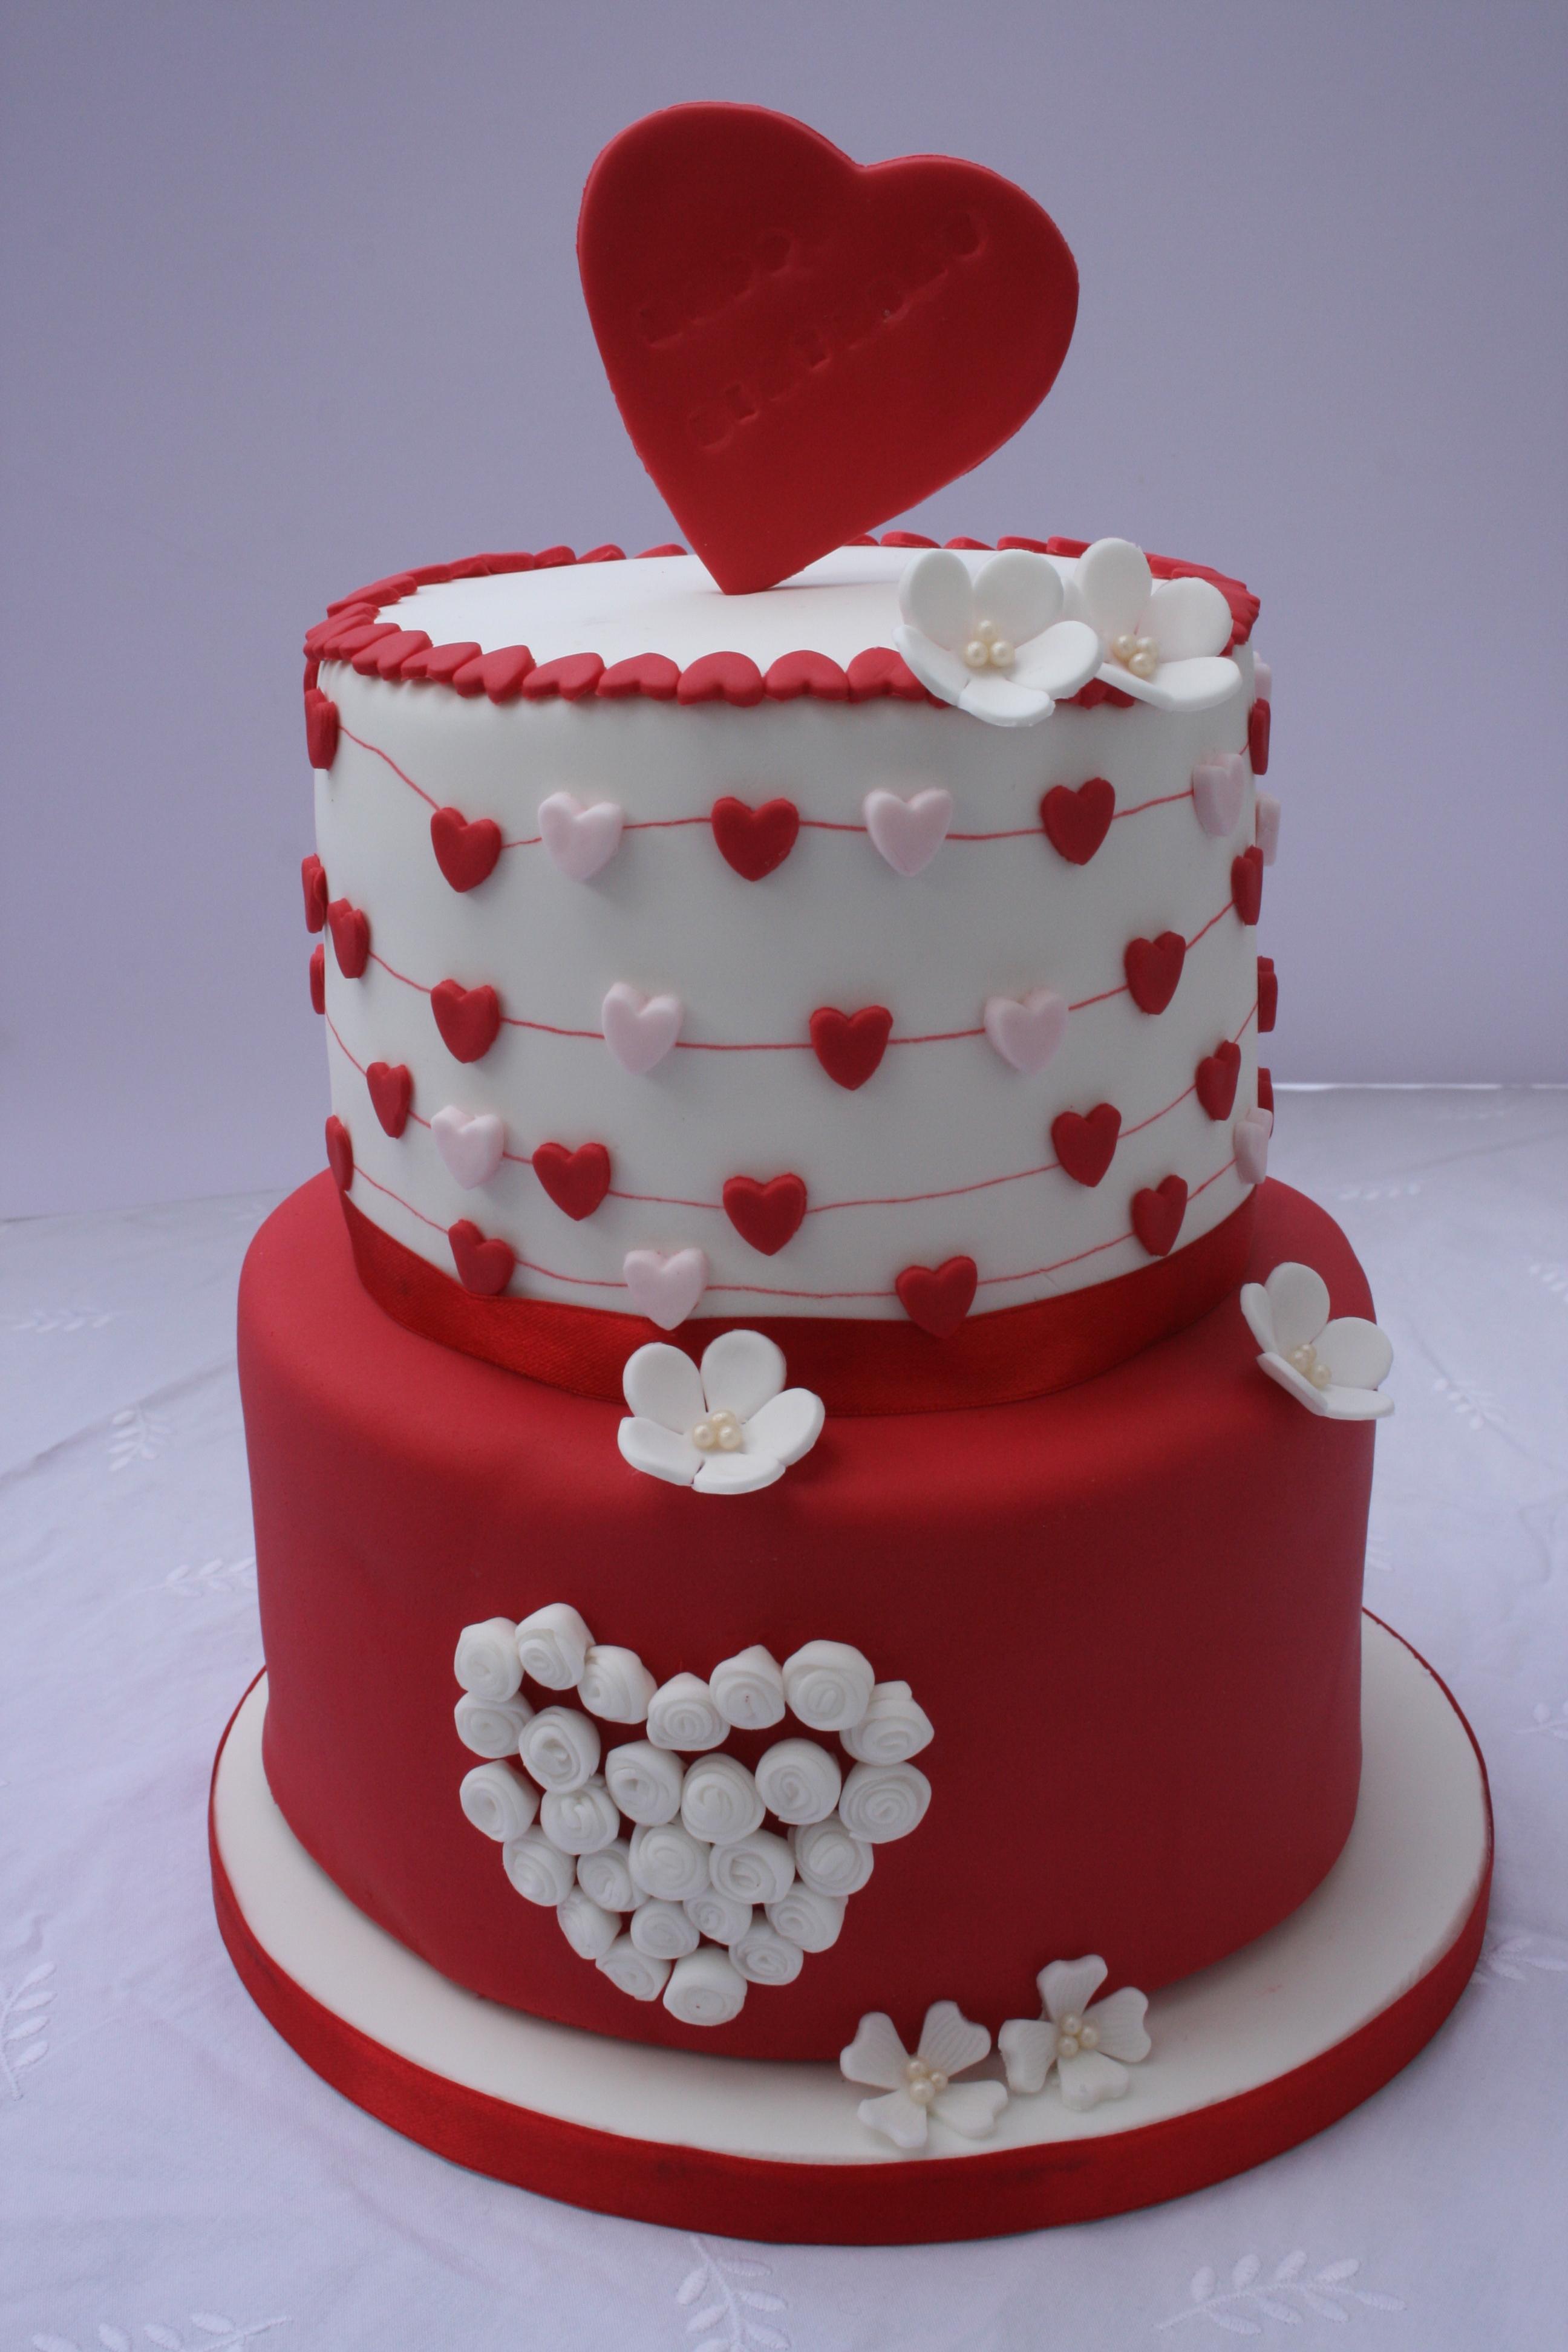 Valentine s Birthday Cake - CakeCentral.com